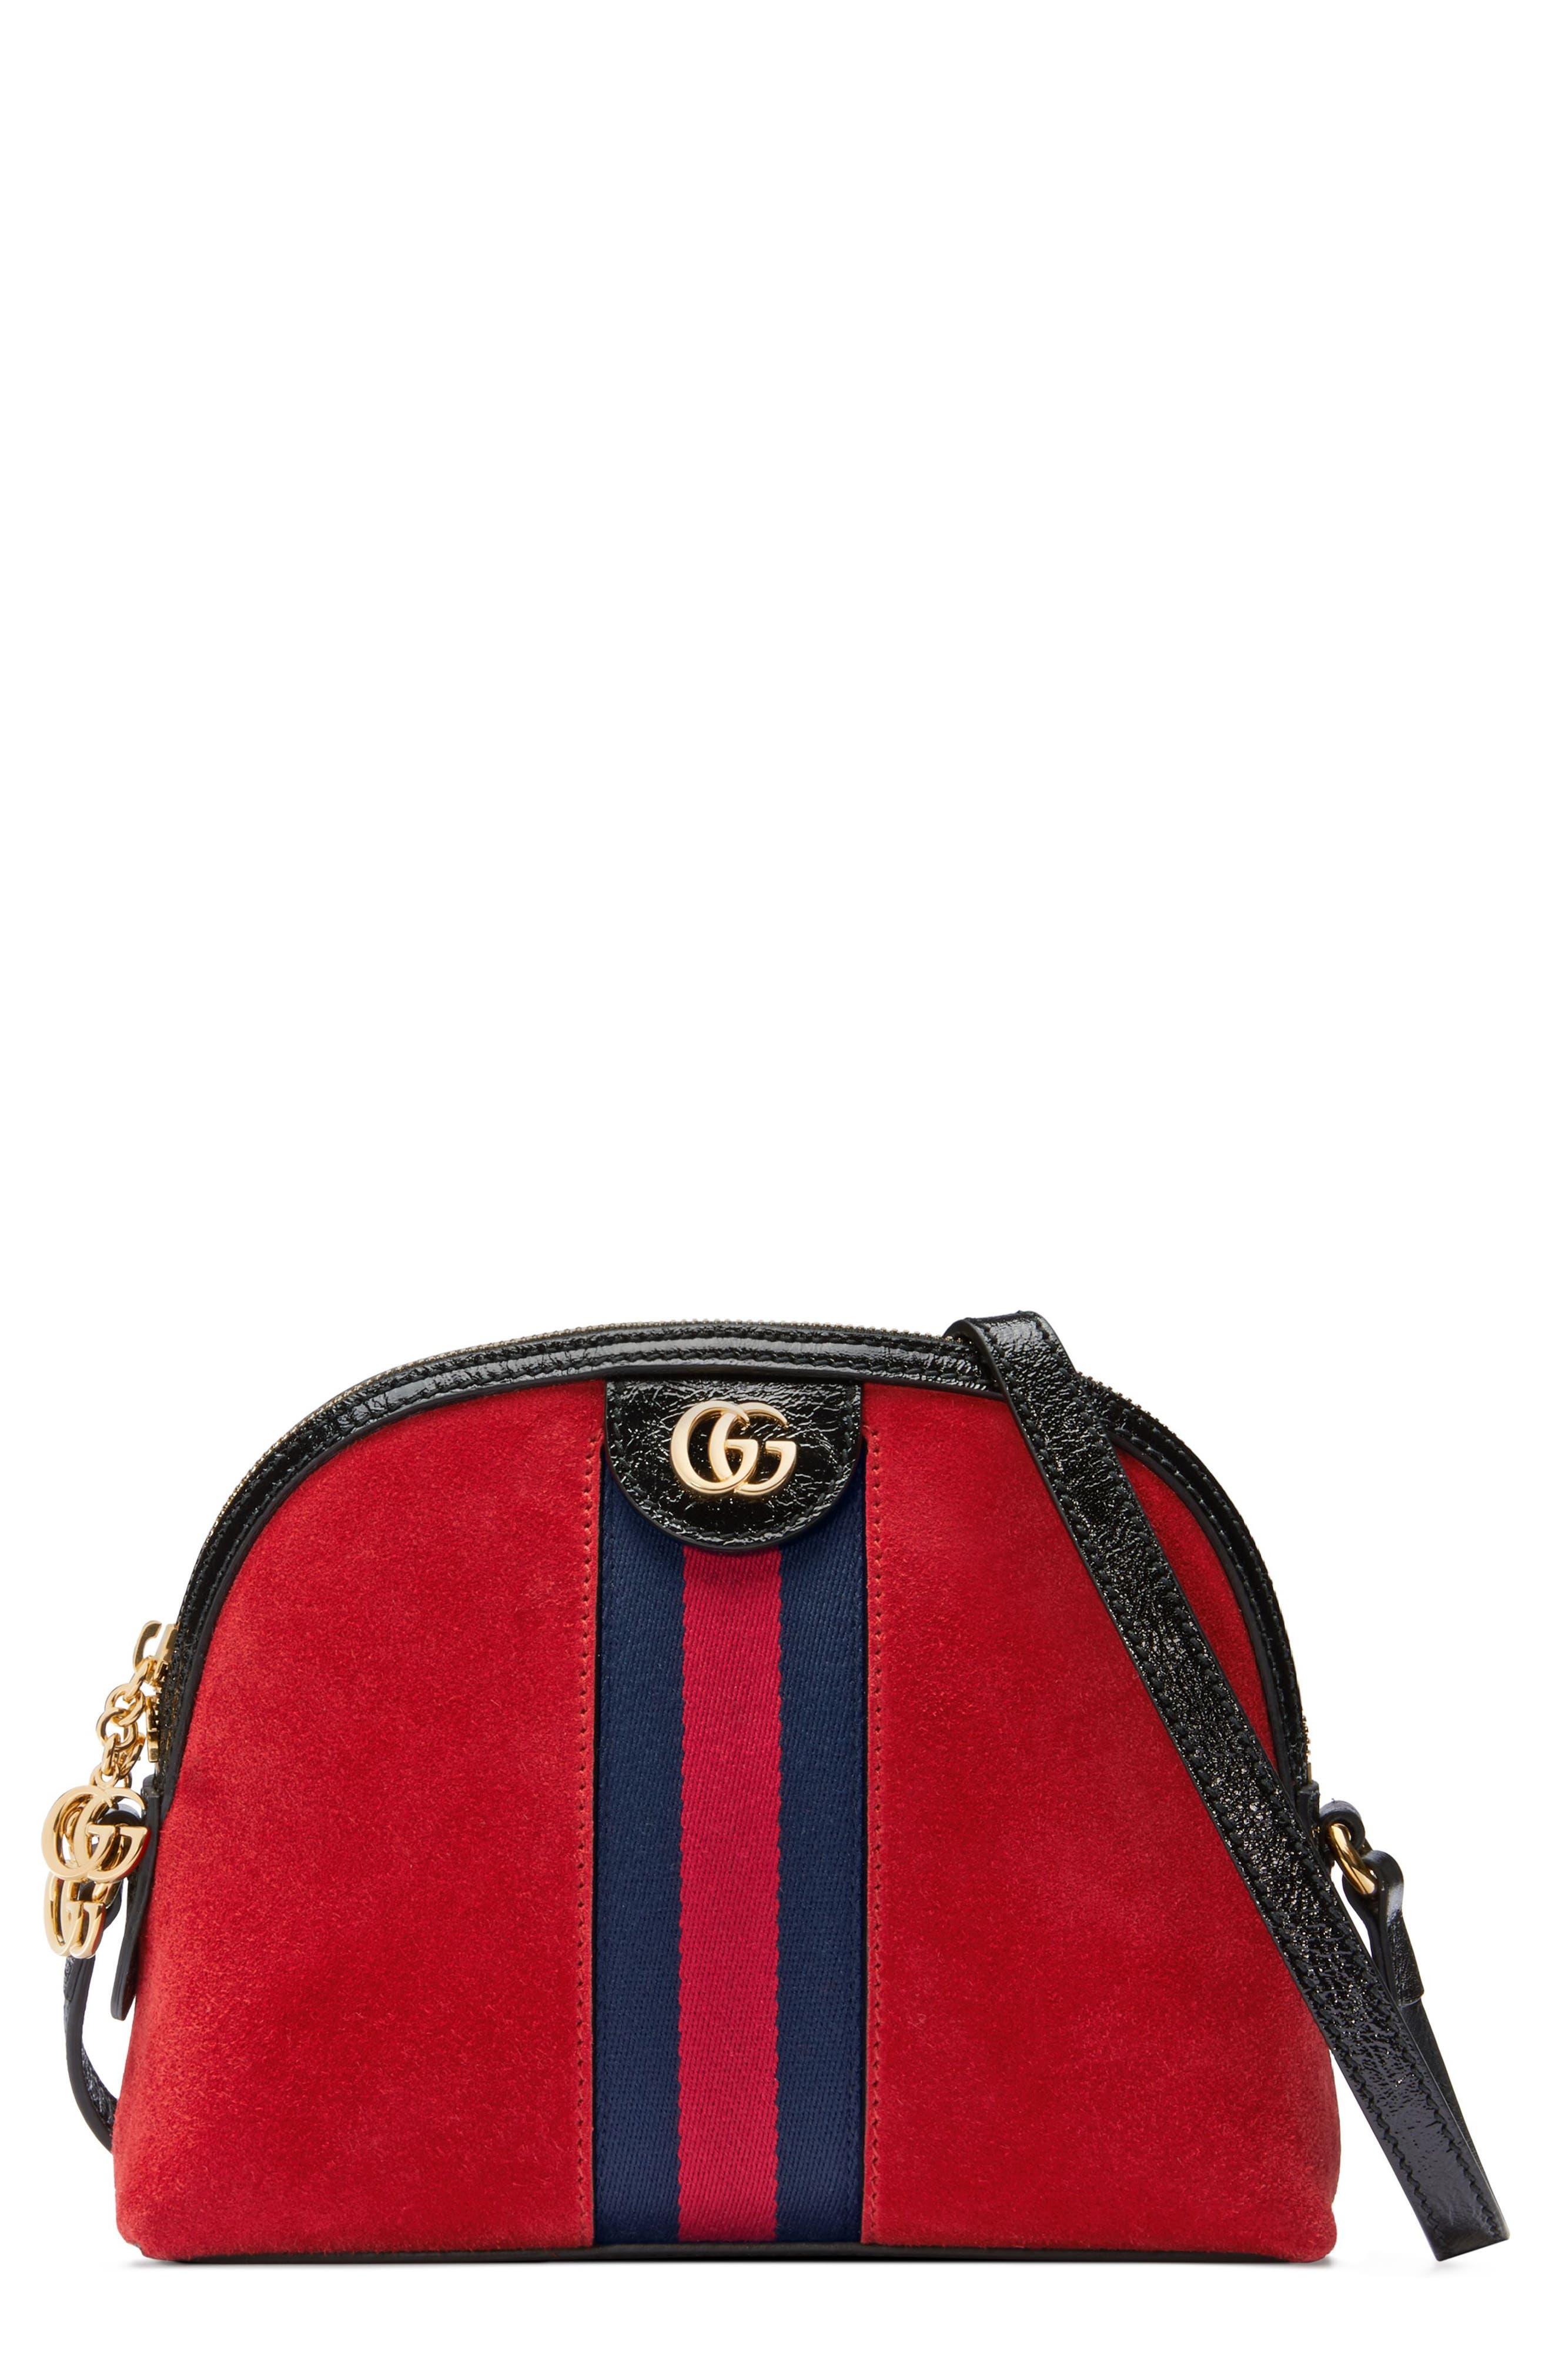 Main Image - Gucci Small Suede Shoulder Bag